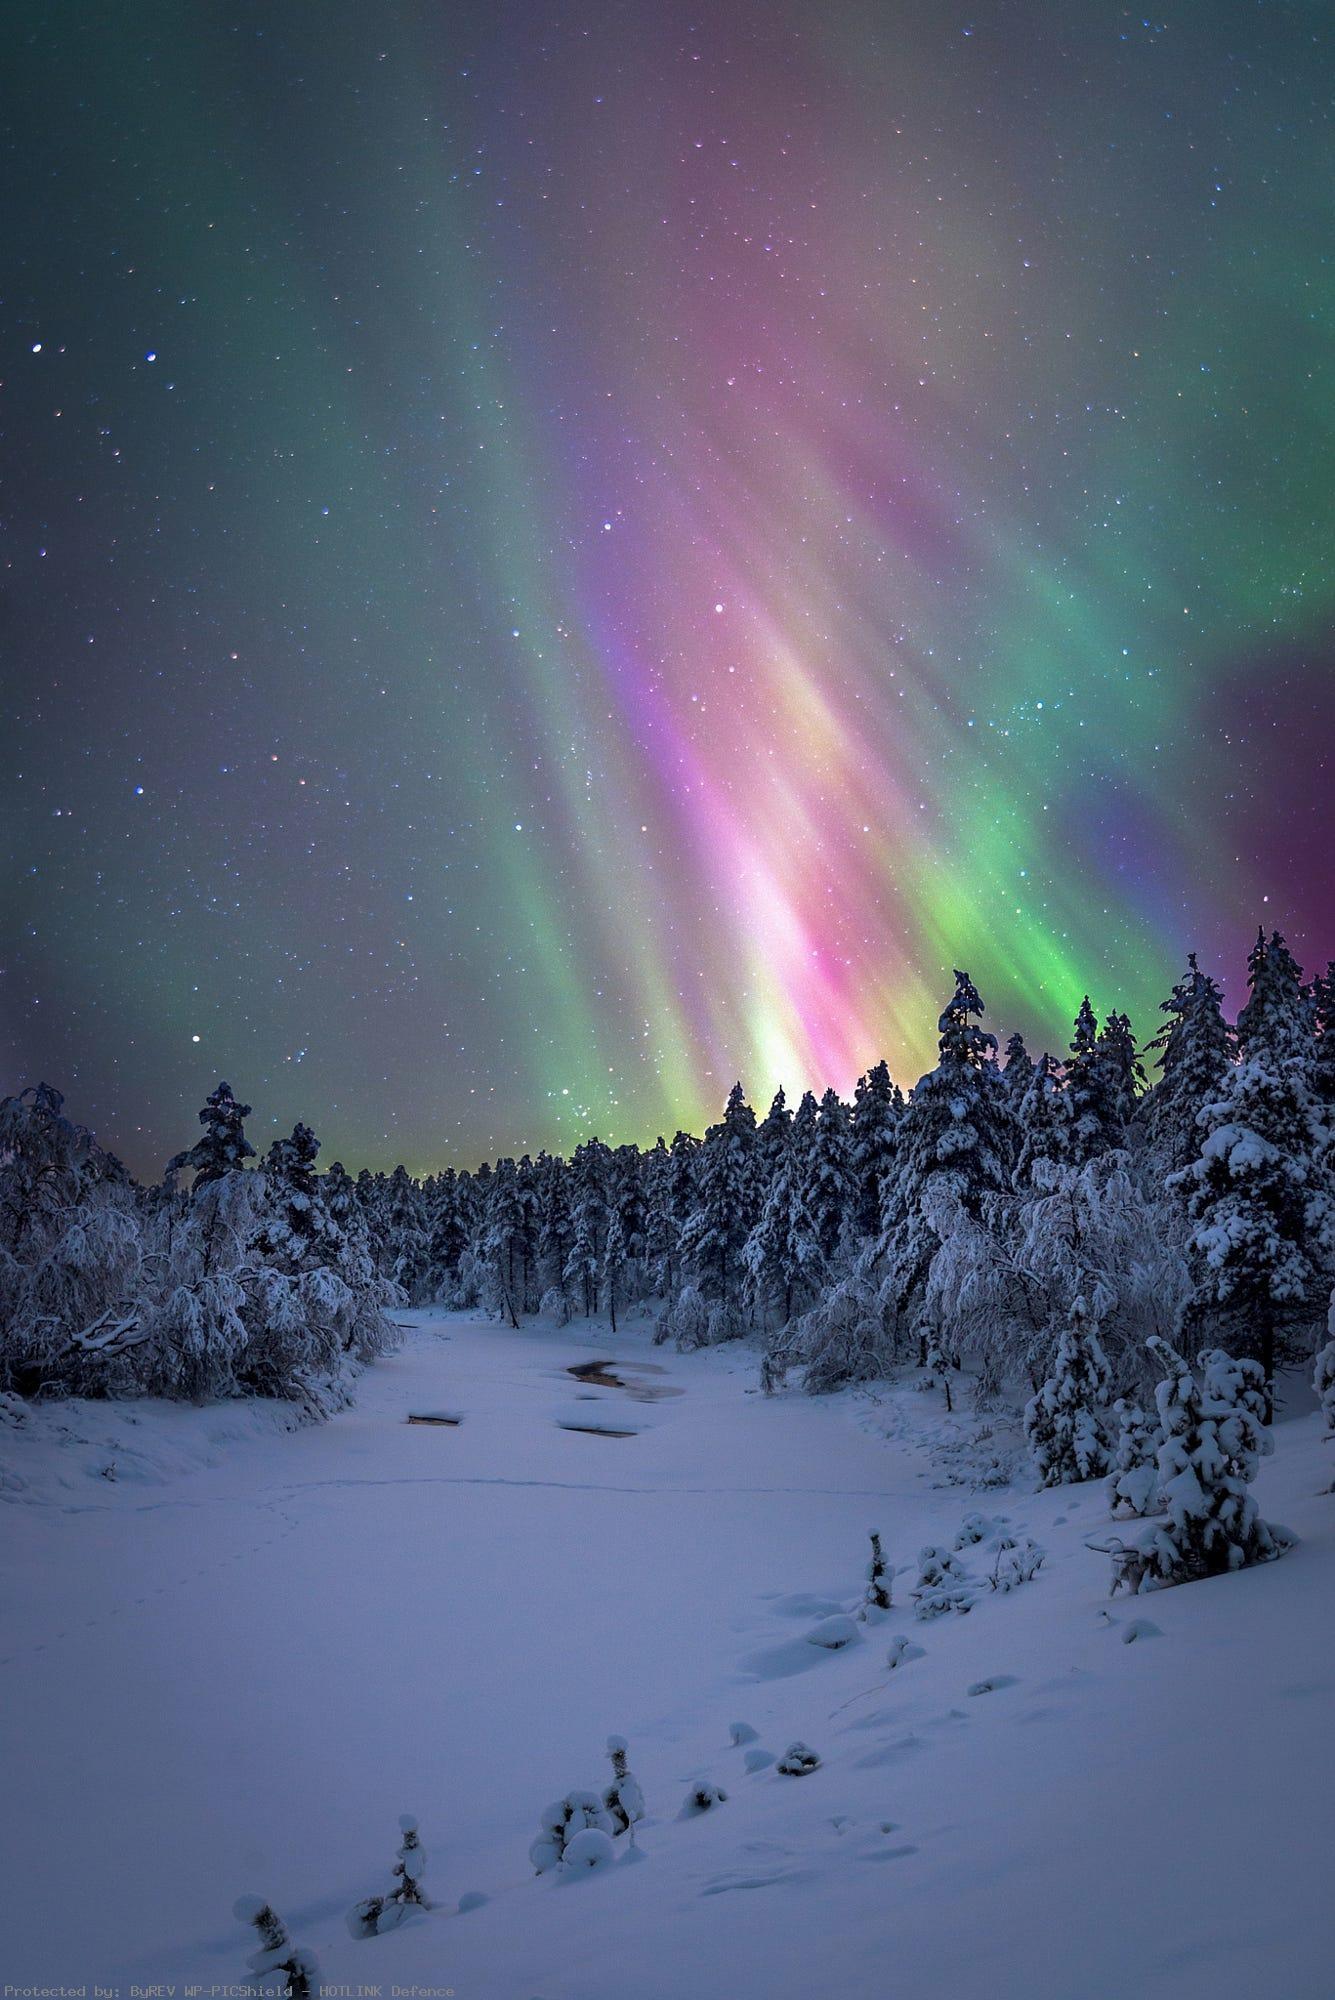 Urho-Kekkonen-National-park-in-far-north-of- · wallpaper-wp4001563